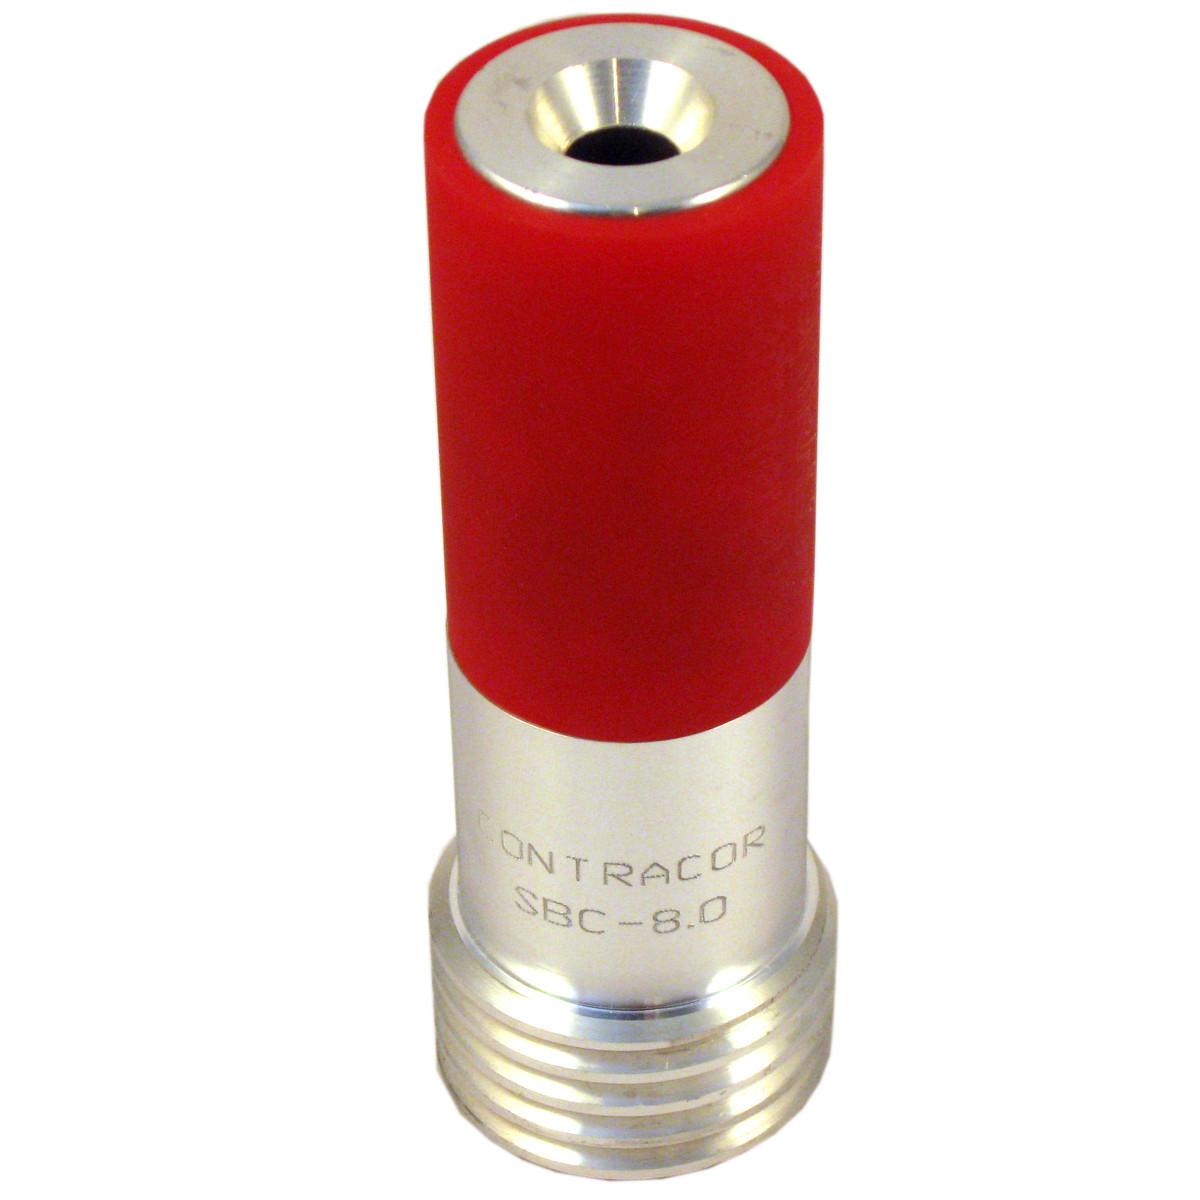 Sandblasting Trysky Attractor SBC-8,0 8 mm Nový